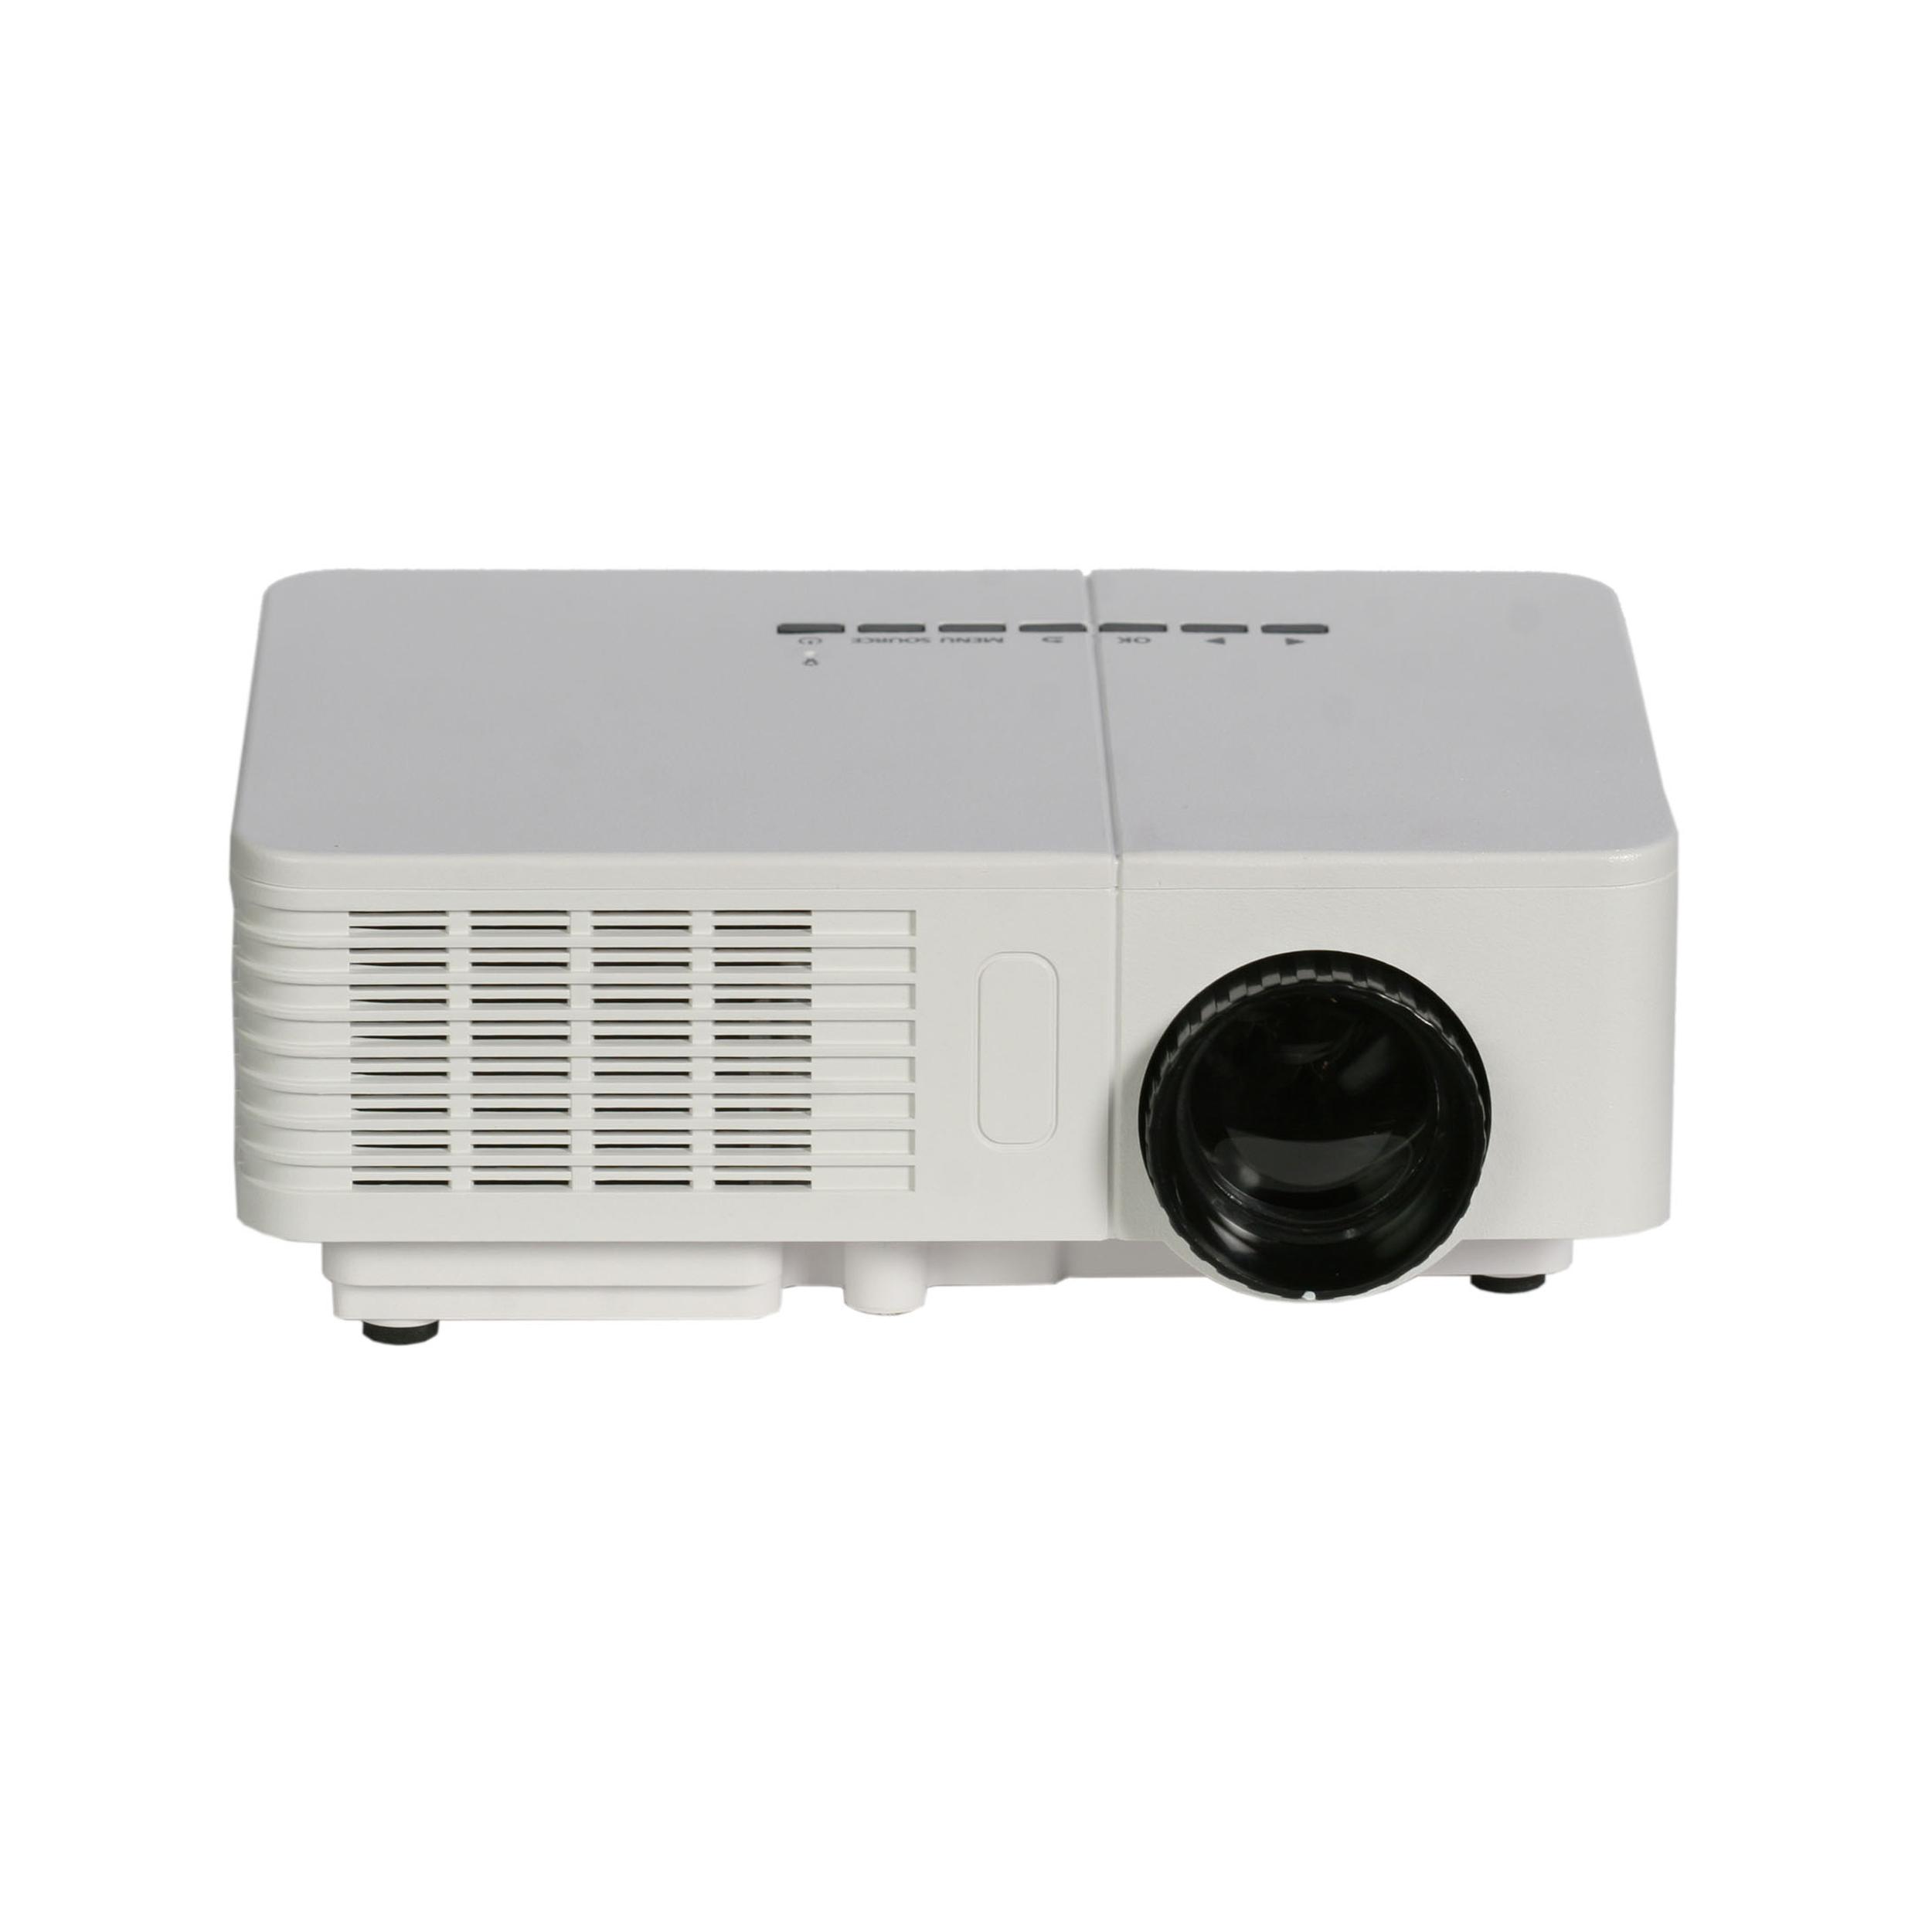 ویدئوپروژکتور قابل حمل مدل T1 PLUS